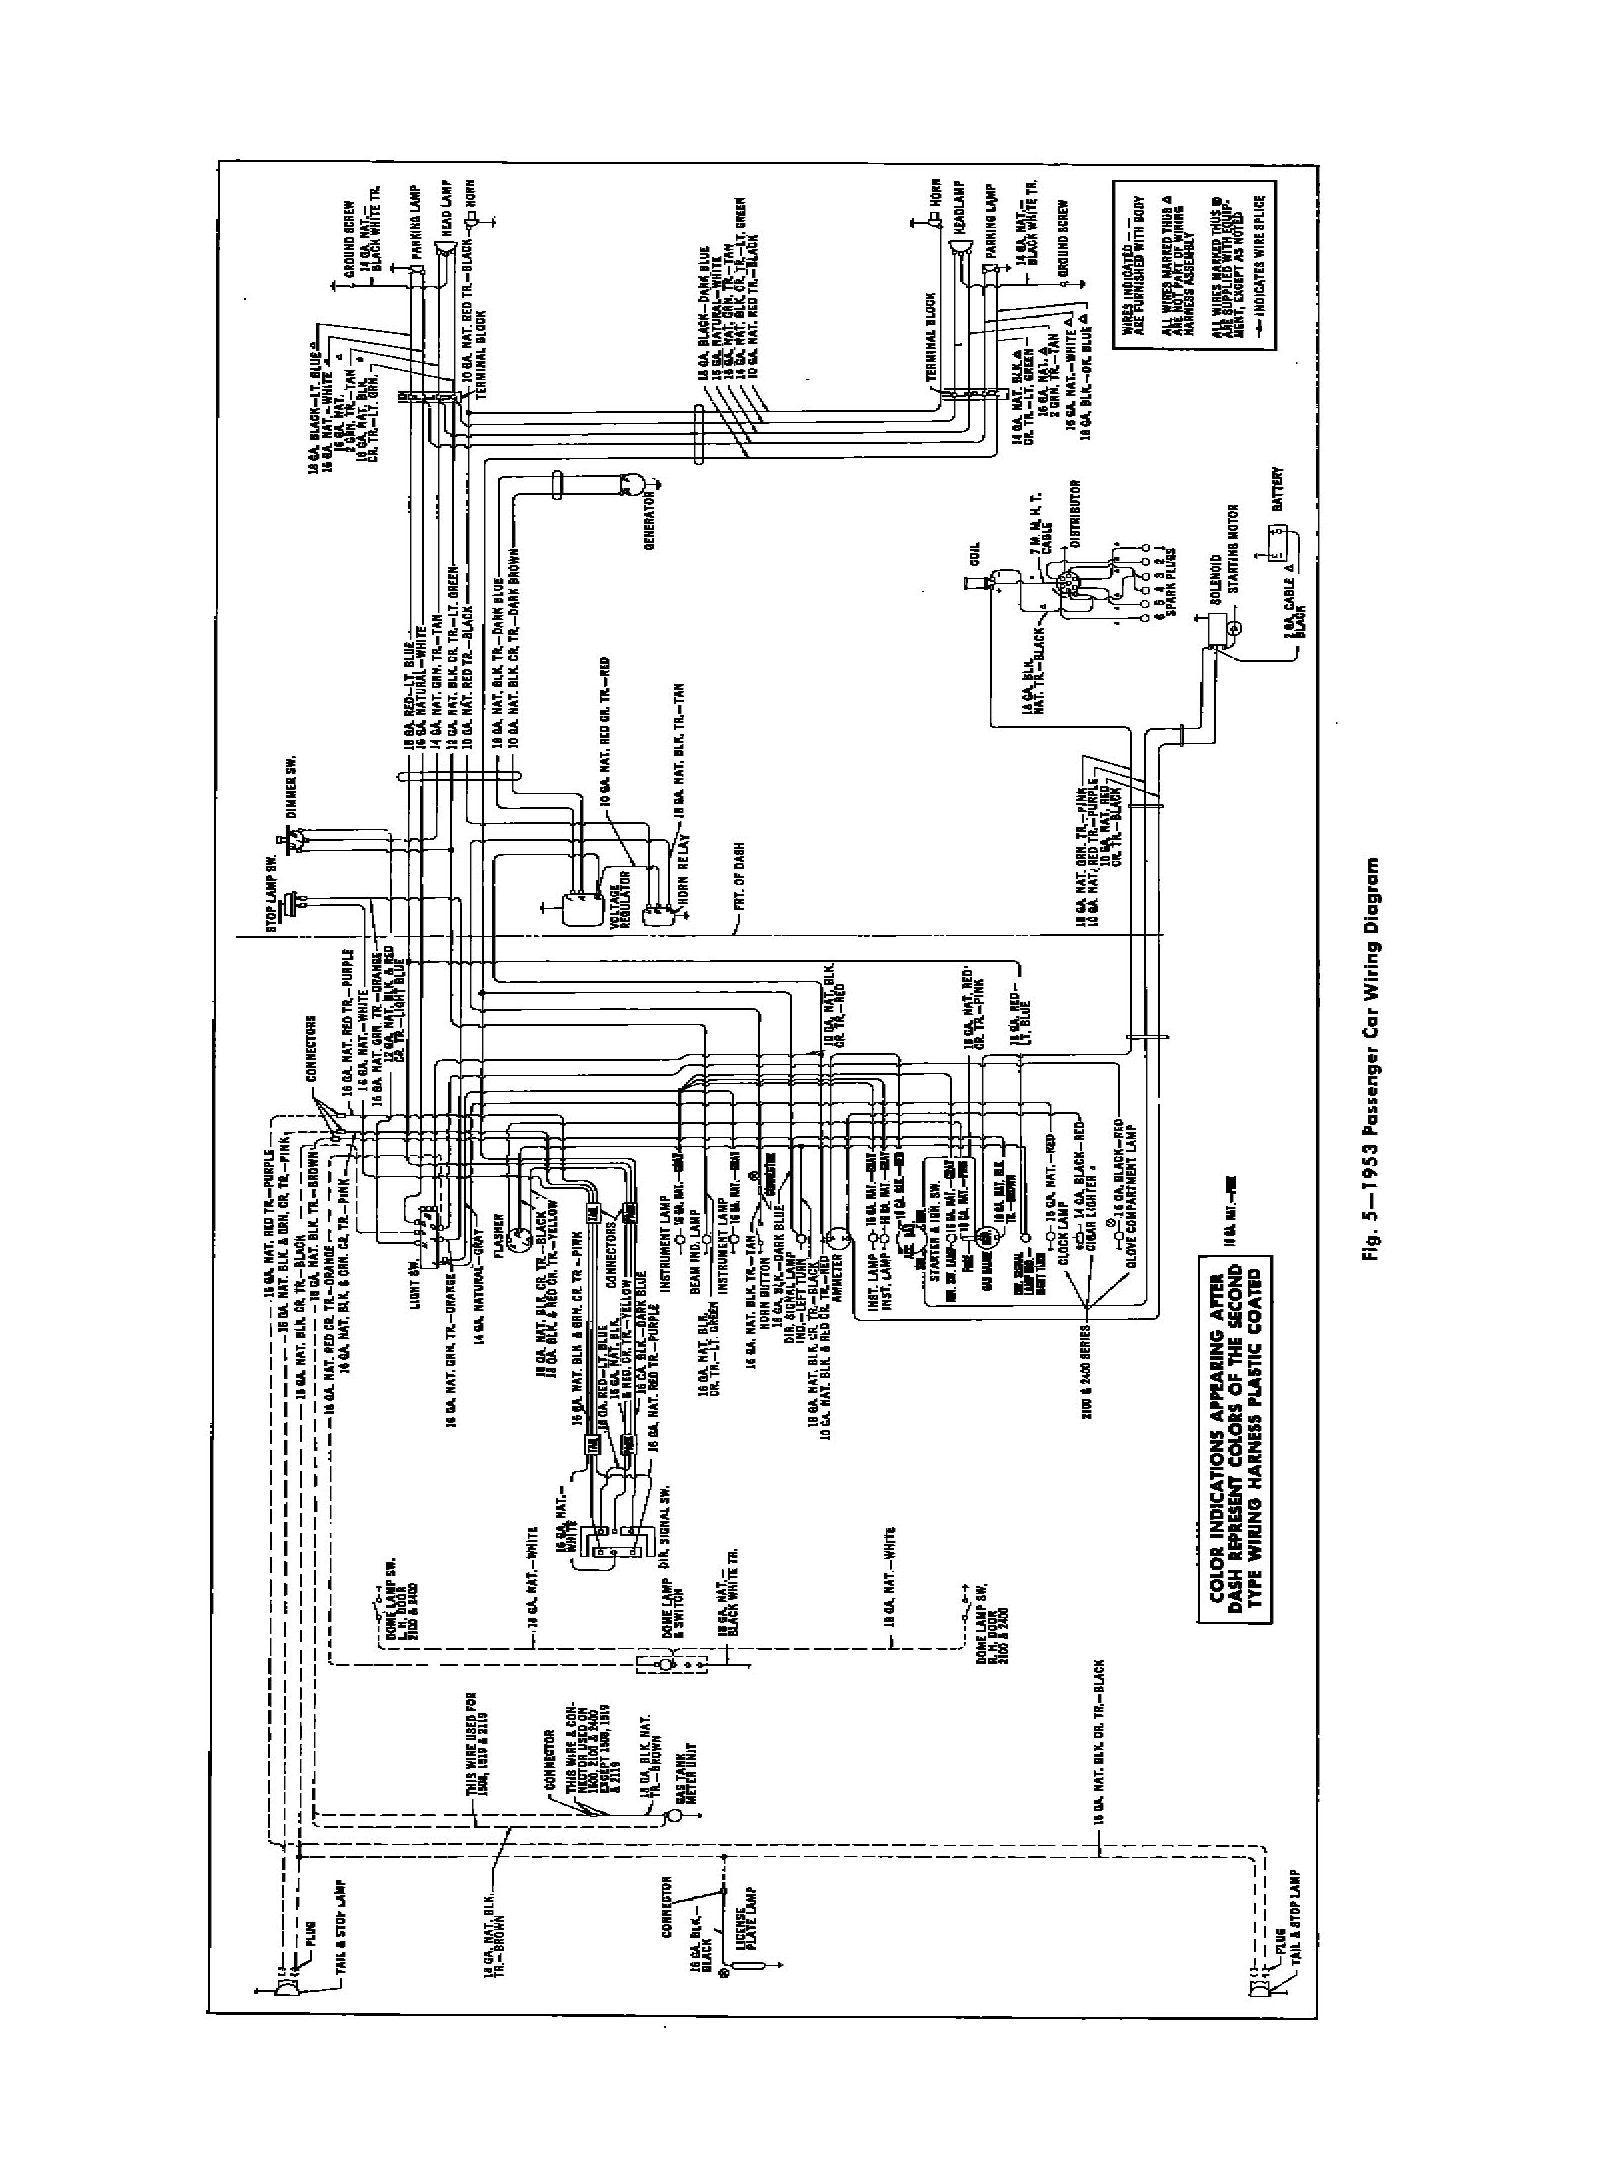 53 Chevy Wiring Diagram